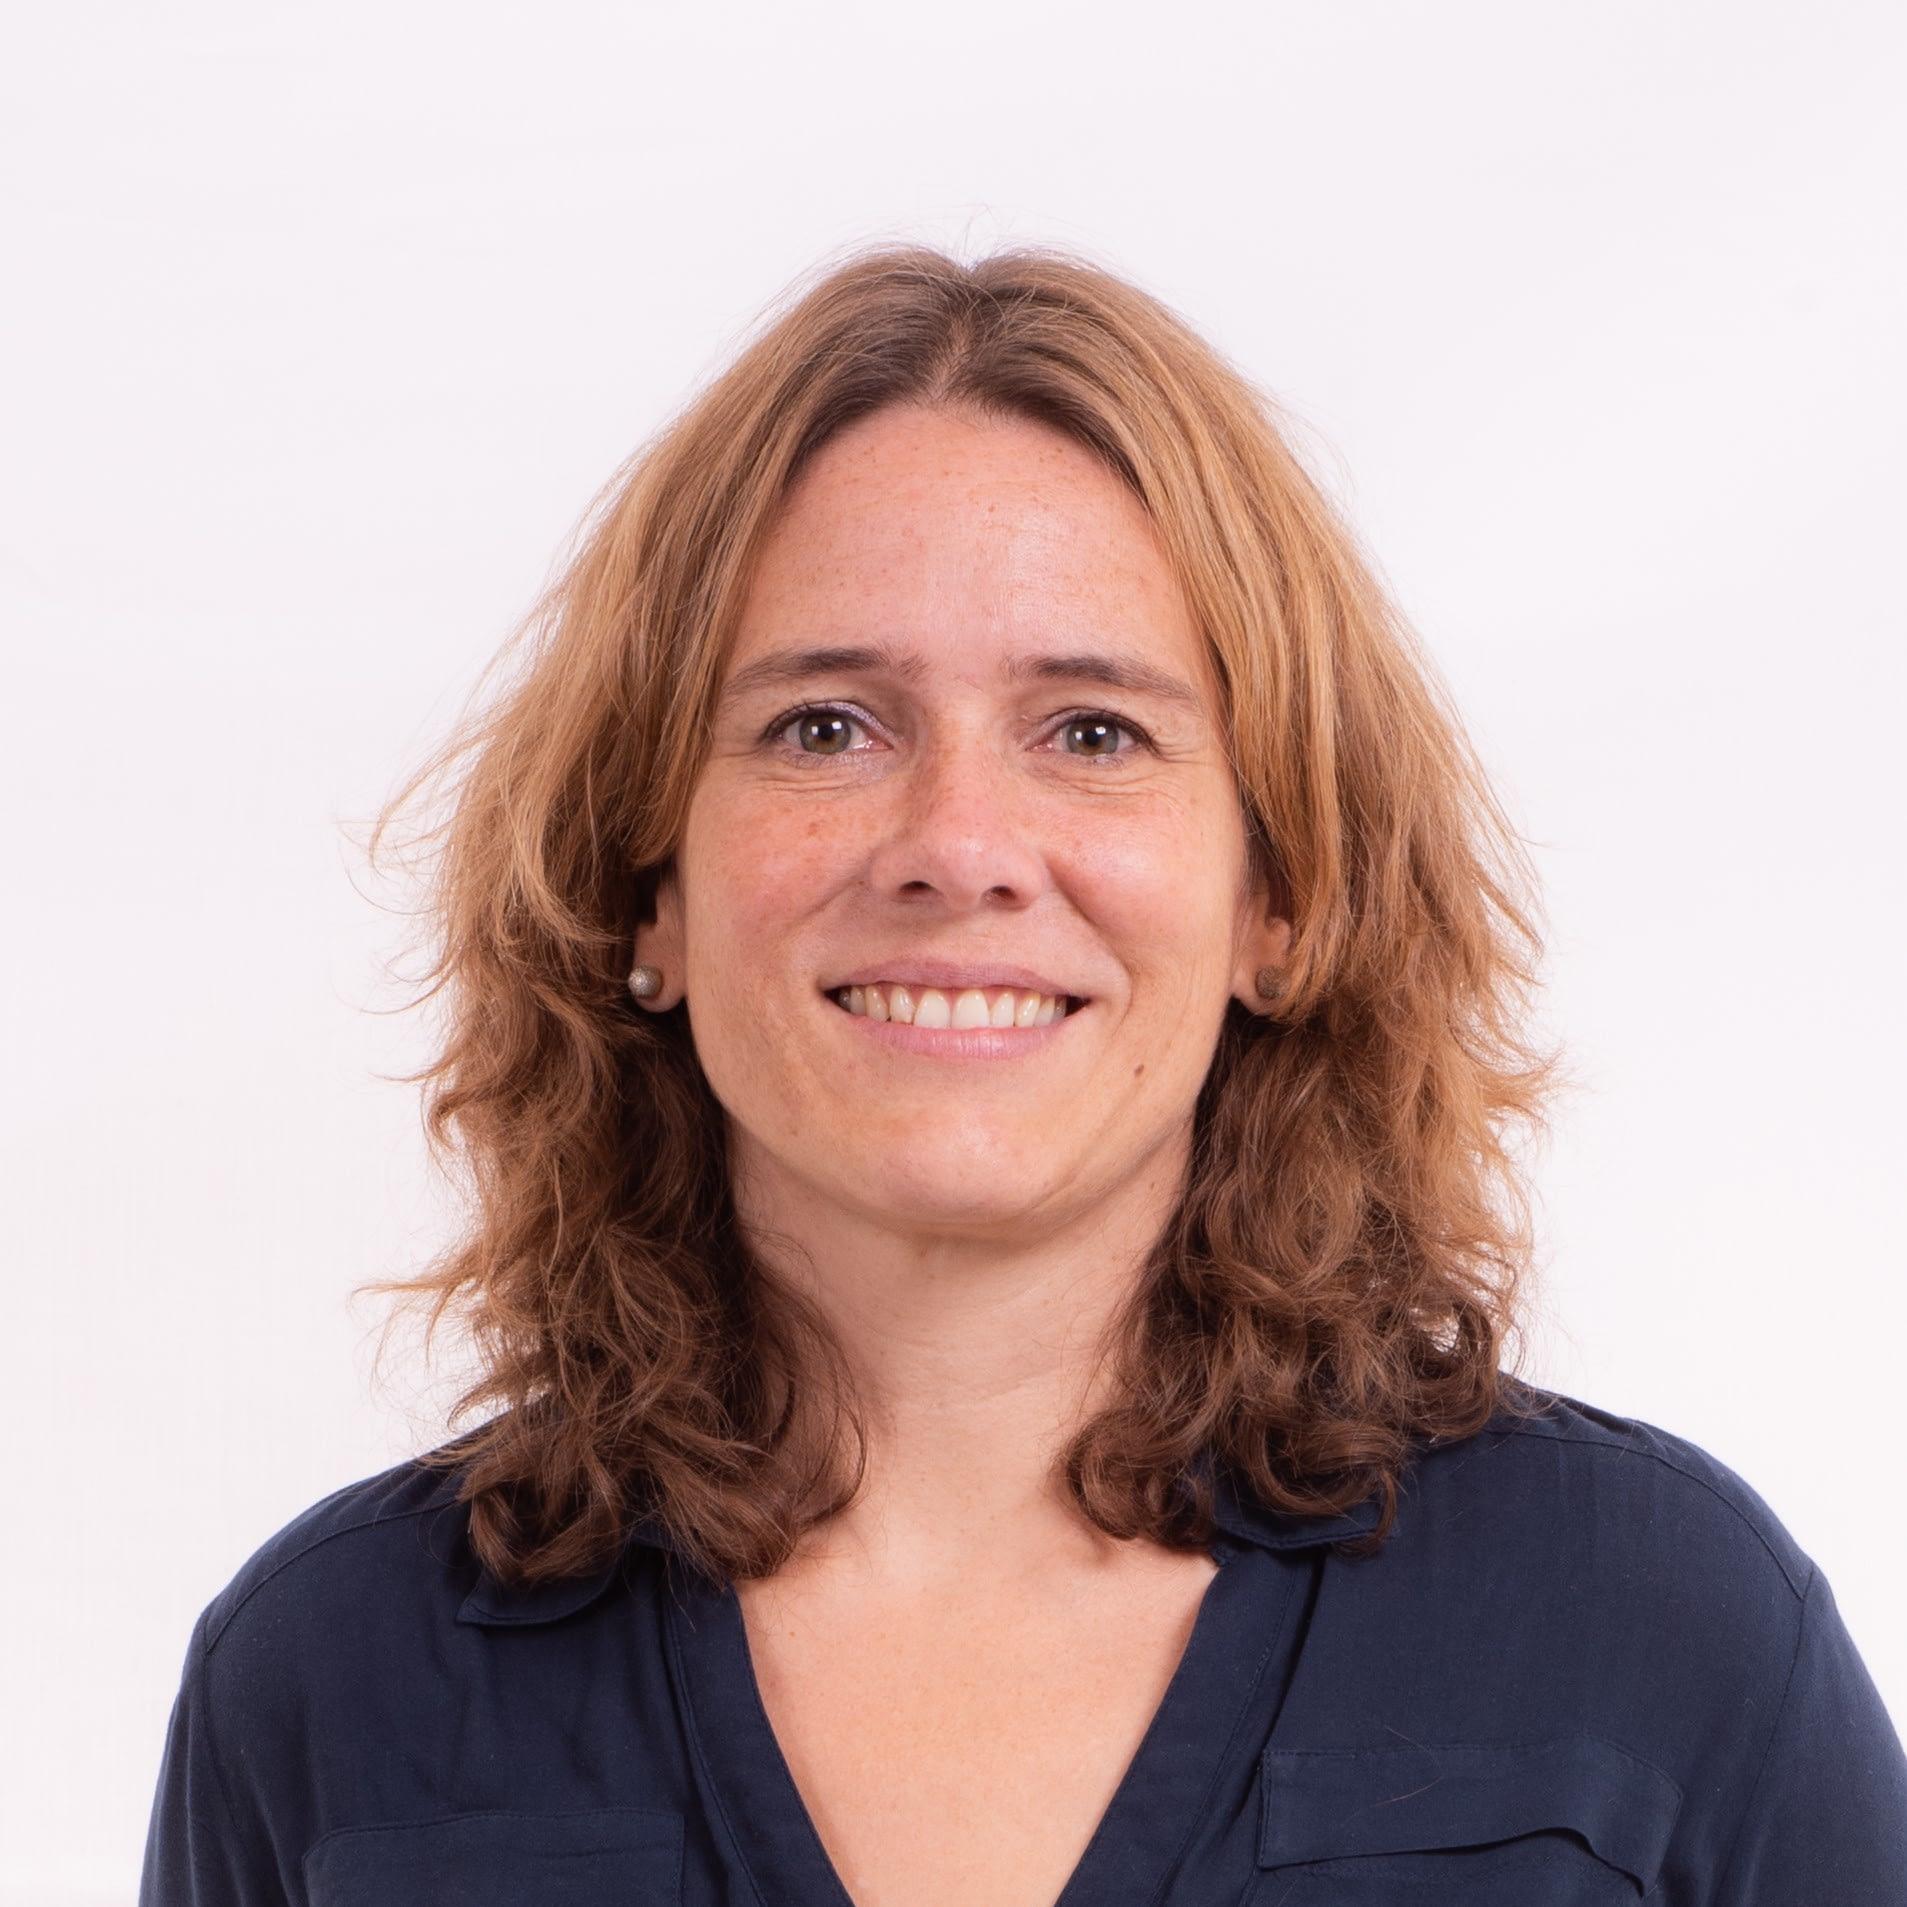 Profile image for Susanne Dreisigacker